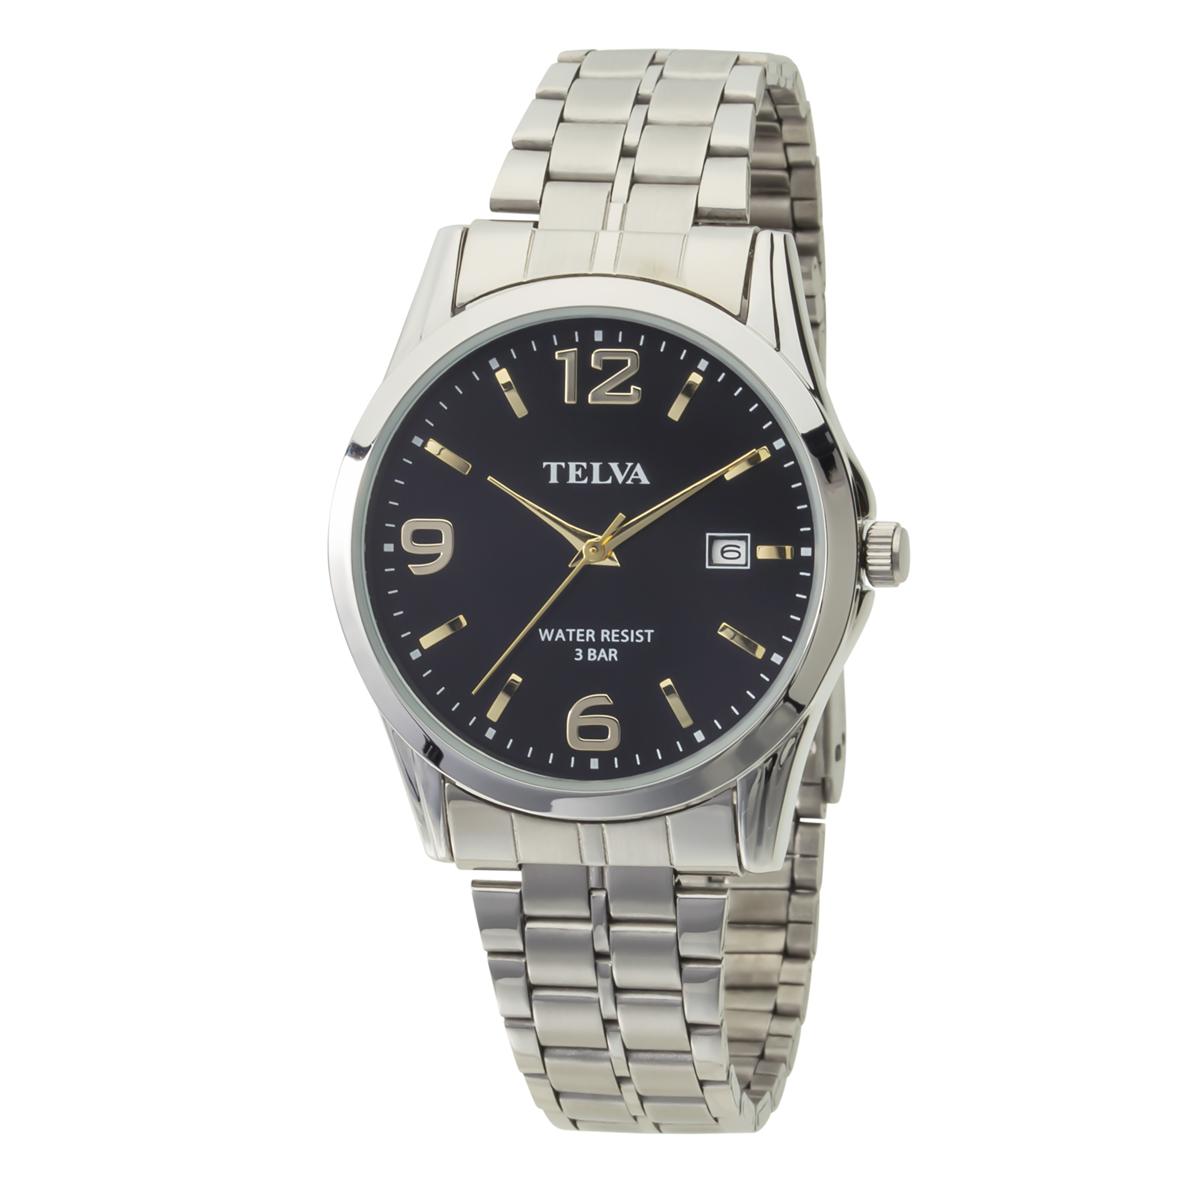 TELVA テルバ アナログウオッチ メンズ 腕時計 薄型針【TE-AM188】